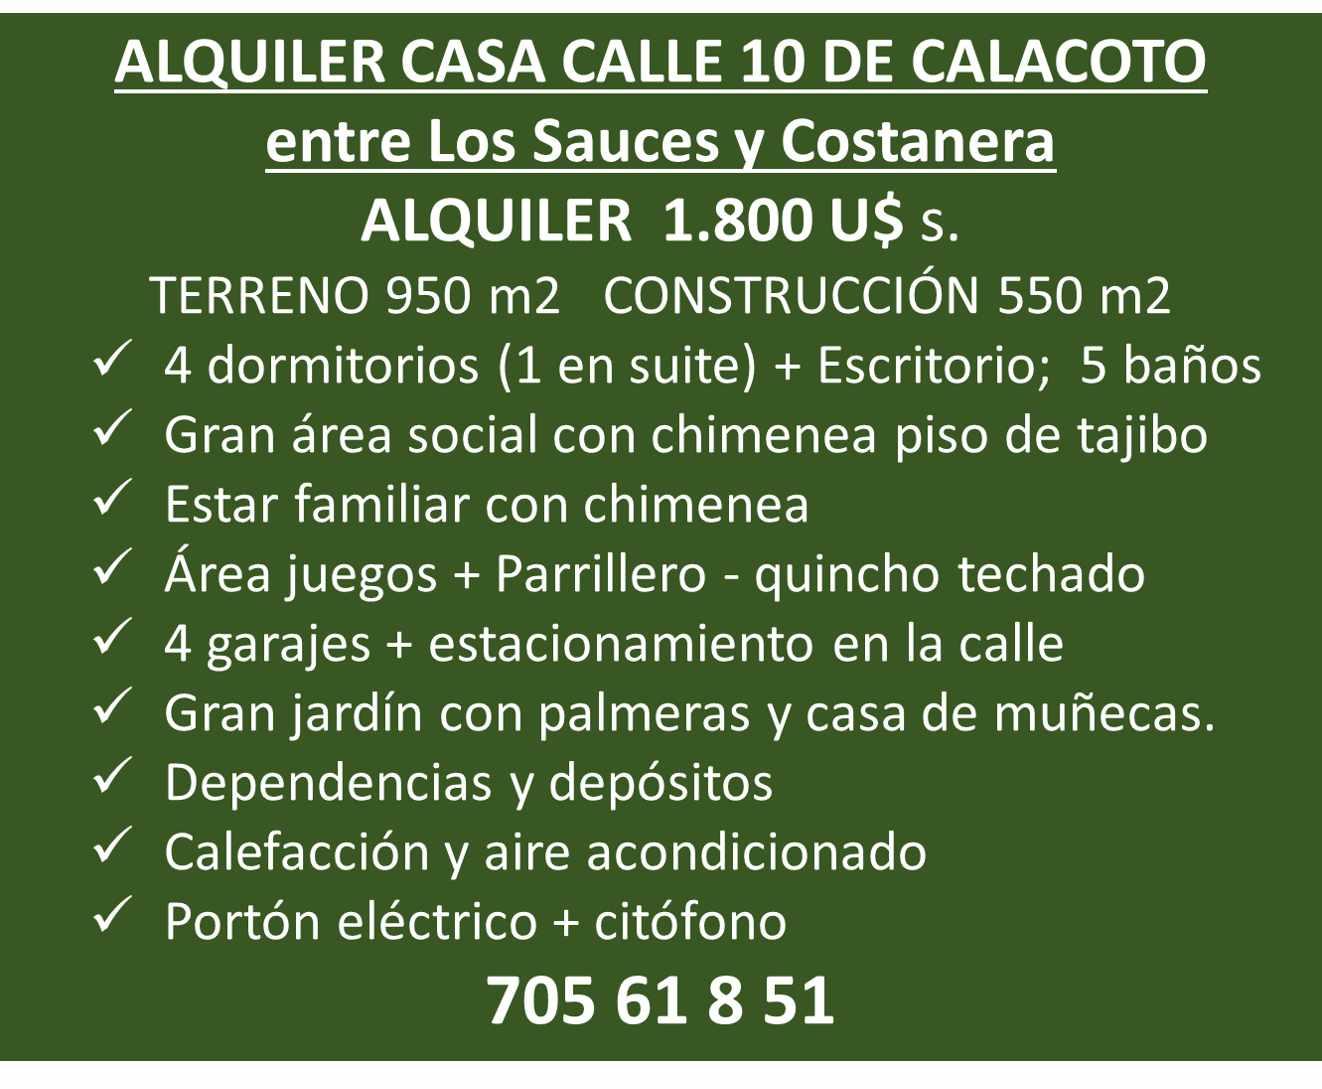 Casa en Alquiler Calle 10 de Calacoto casi esq Av. Costanera Foto 1